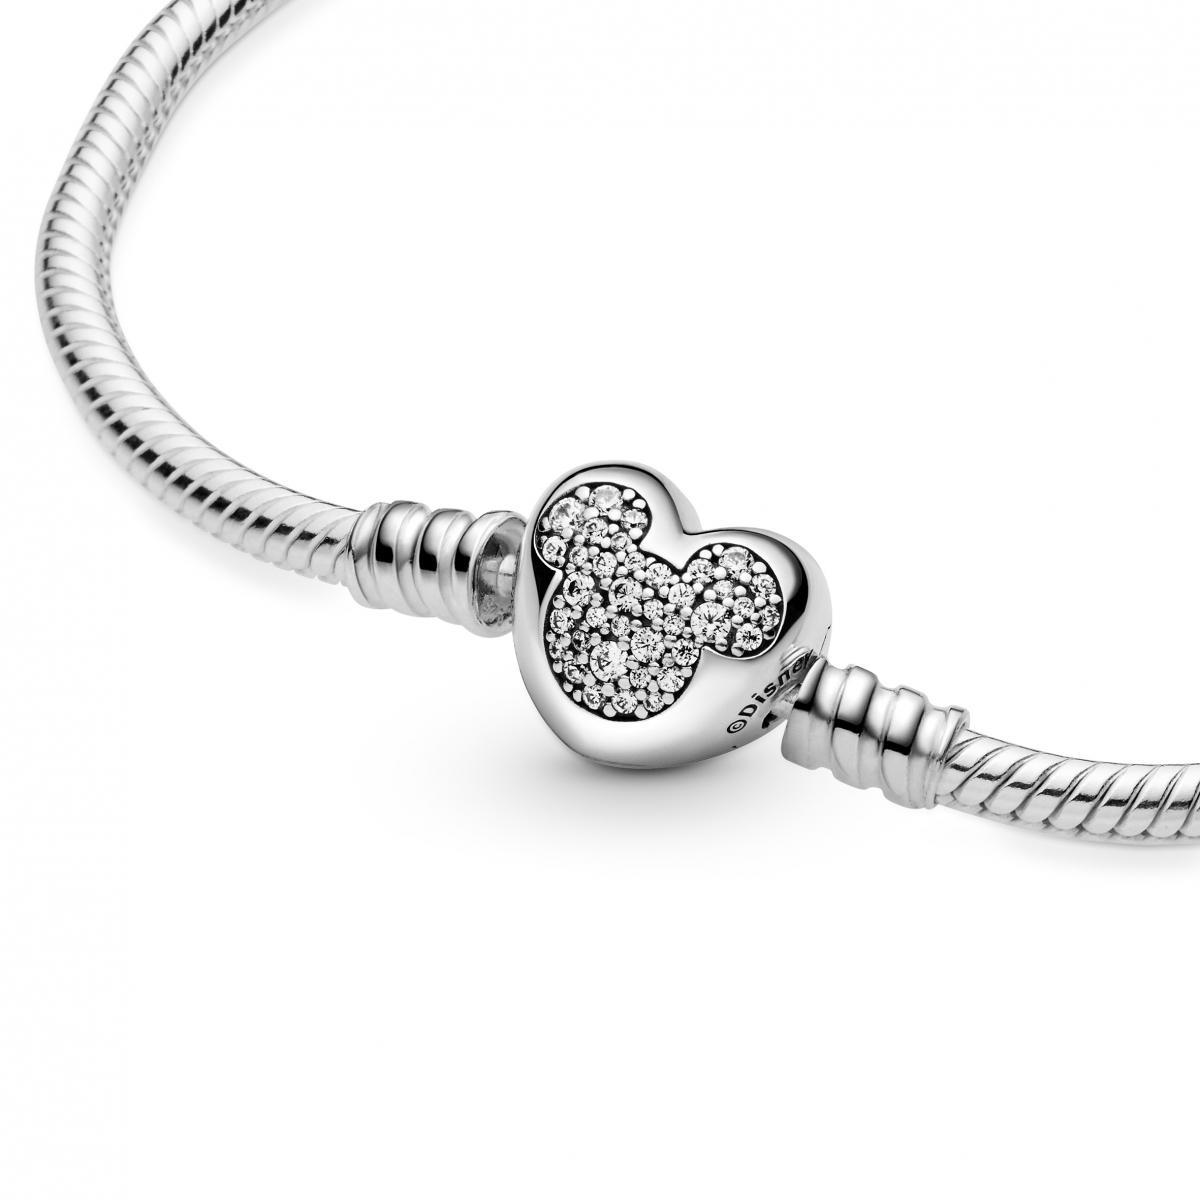 Bracelet Disney Maille Serpent Fermoir Cœur Mickey Moments 599299C01  Pandora Bijoux